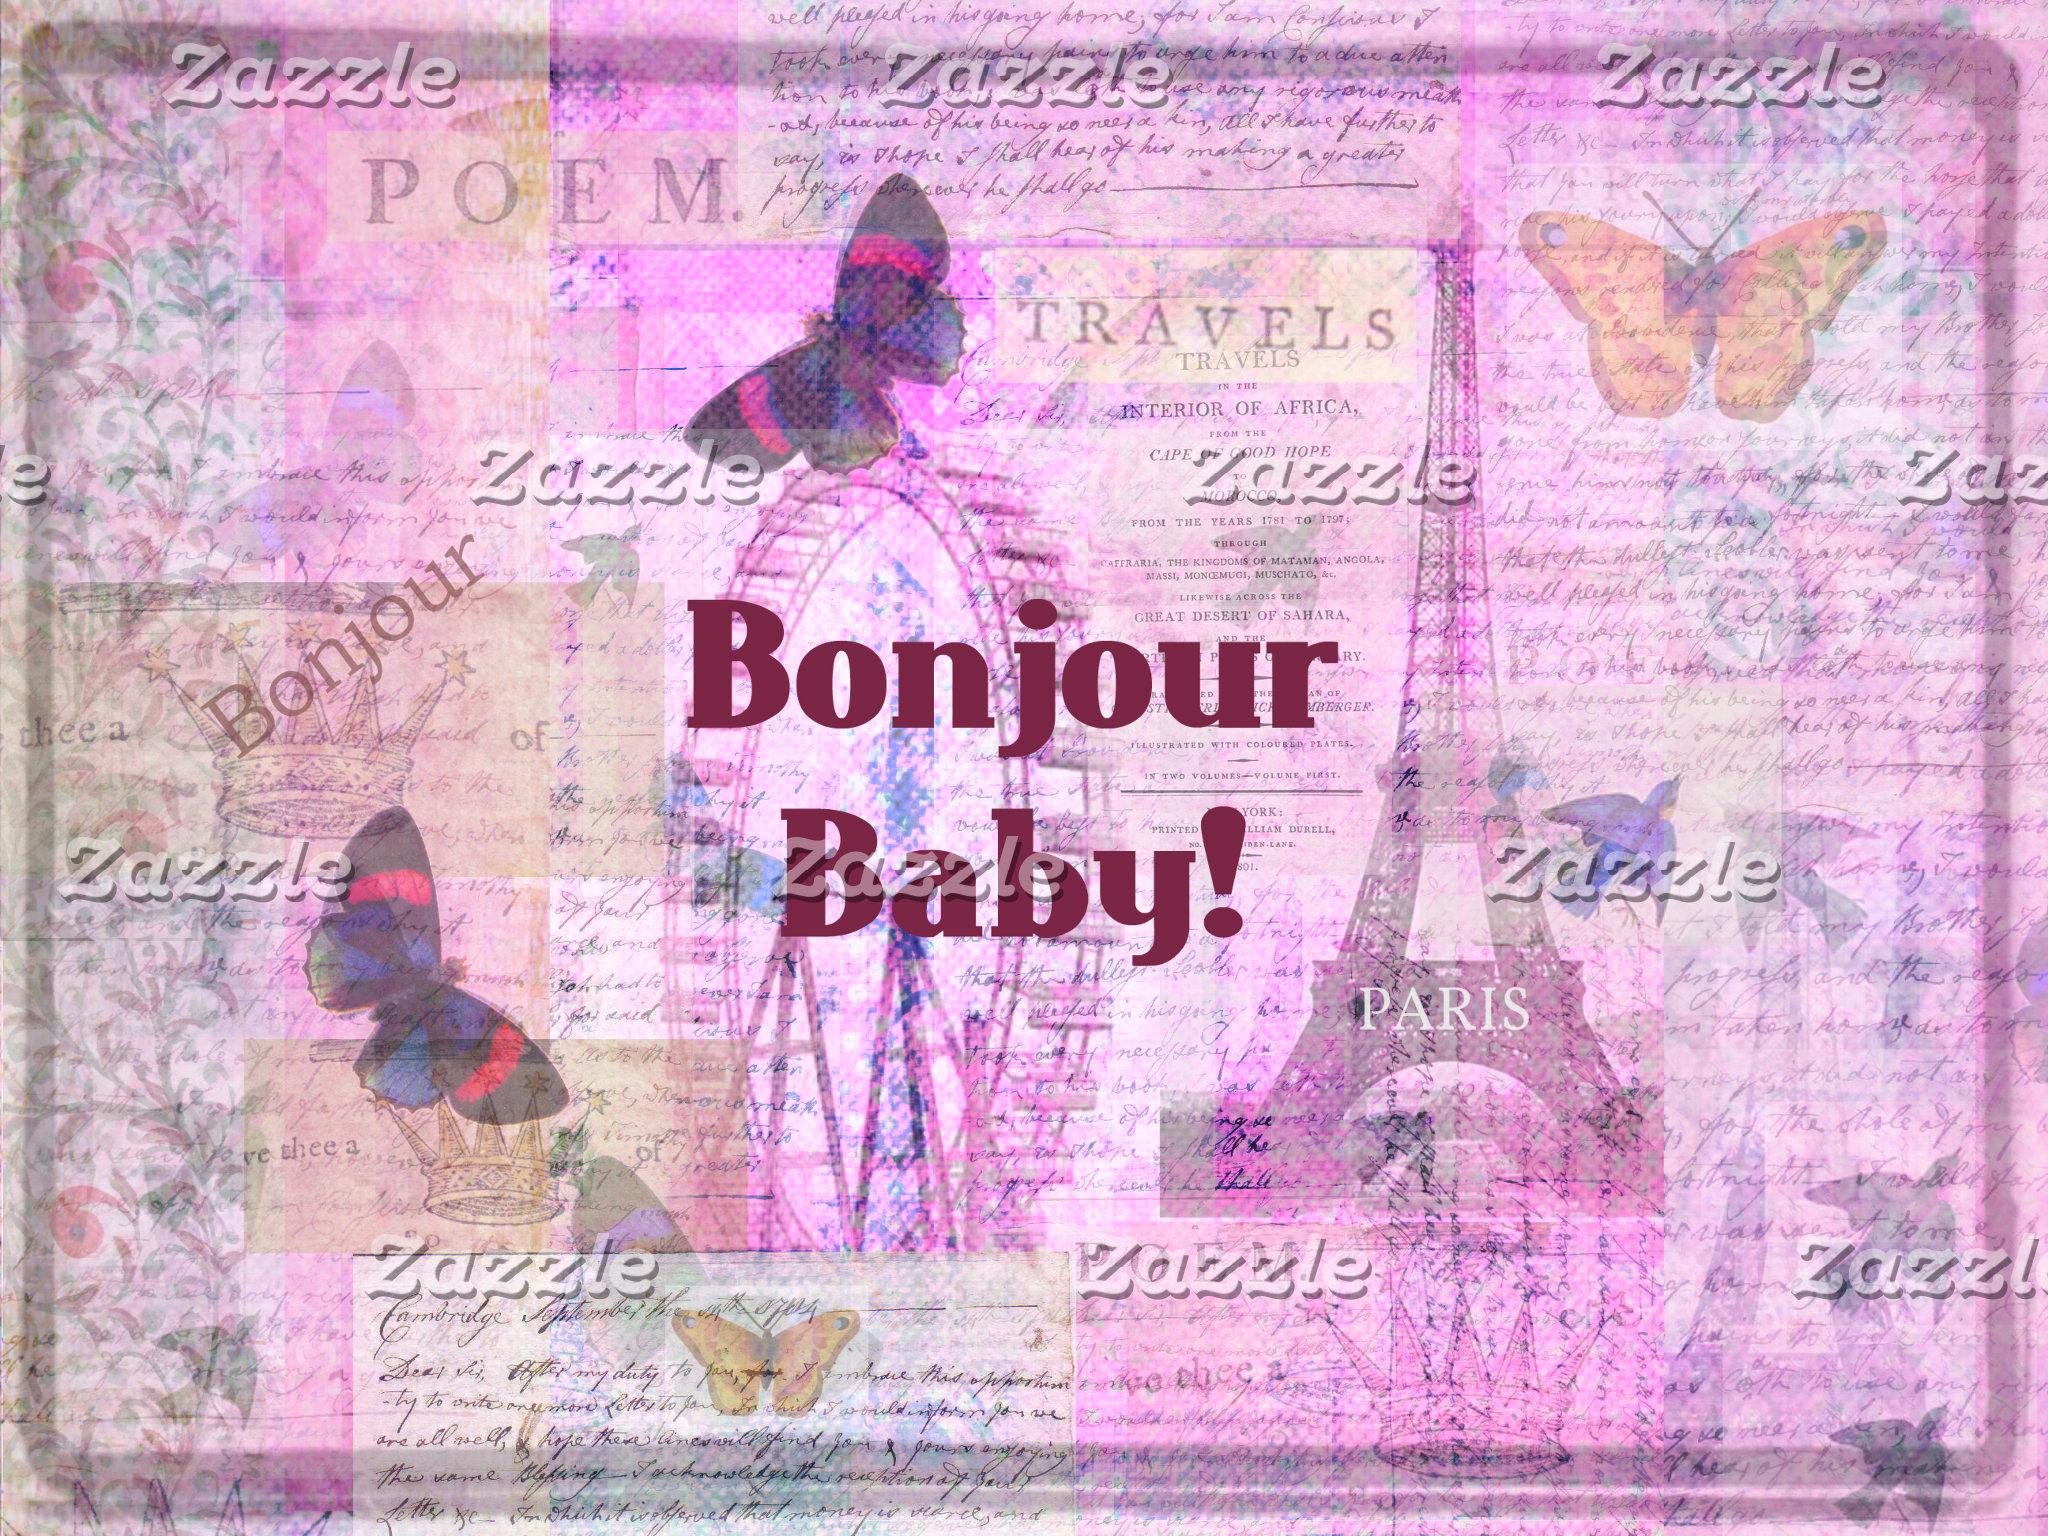 BONJOUR BABY